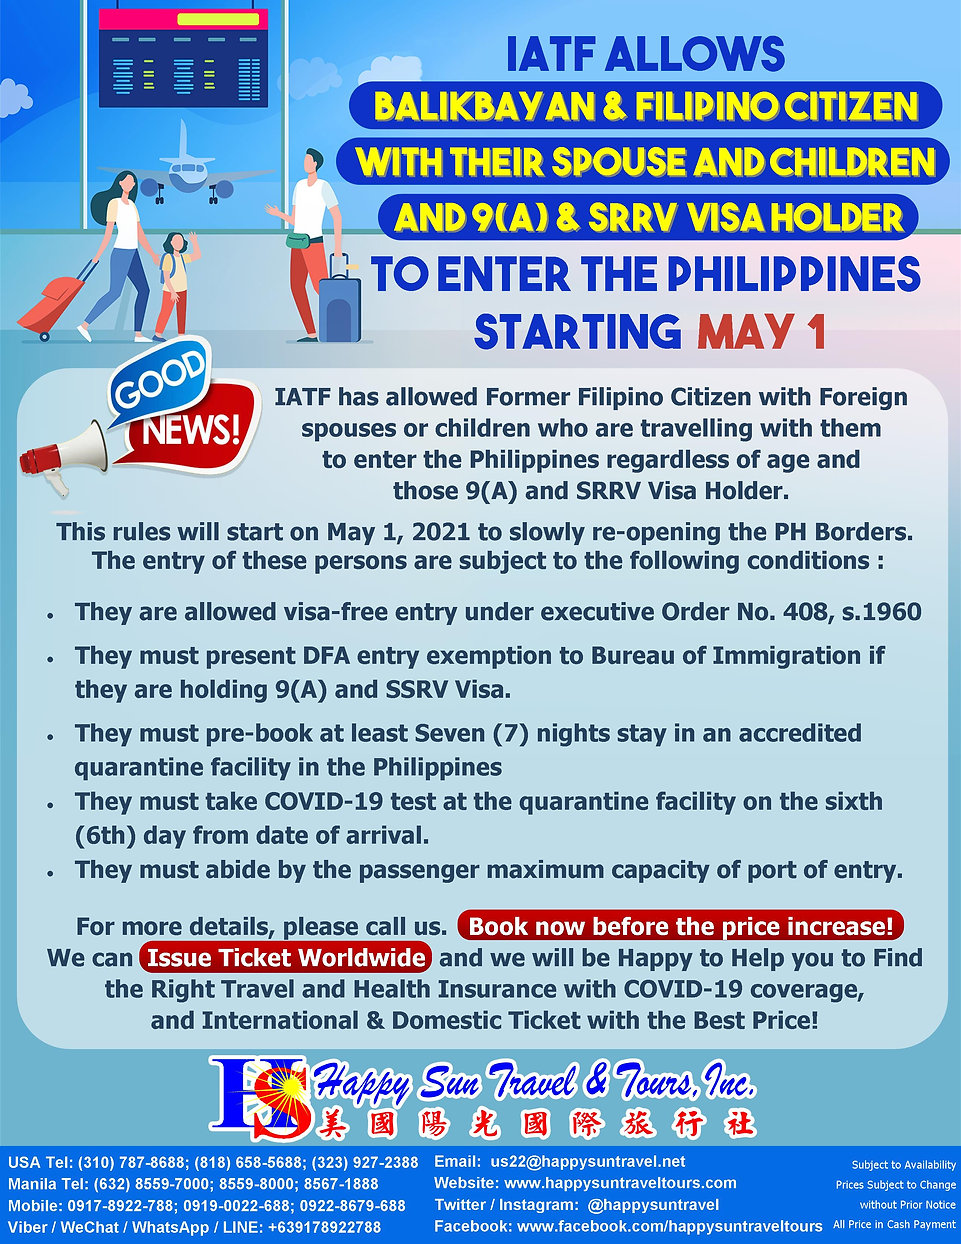 P1_HappySunTravel_FilipnosSpouse&Kids, 9